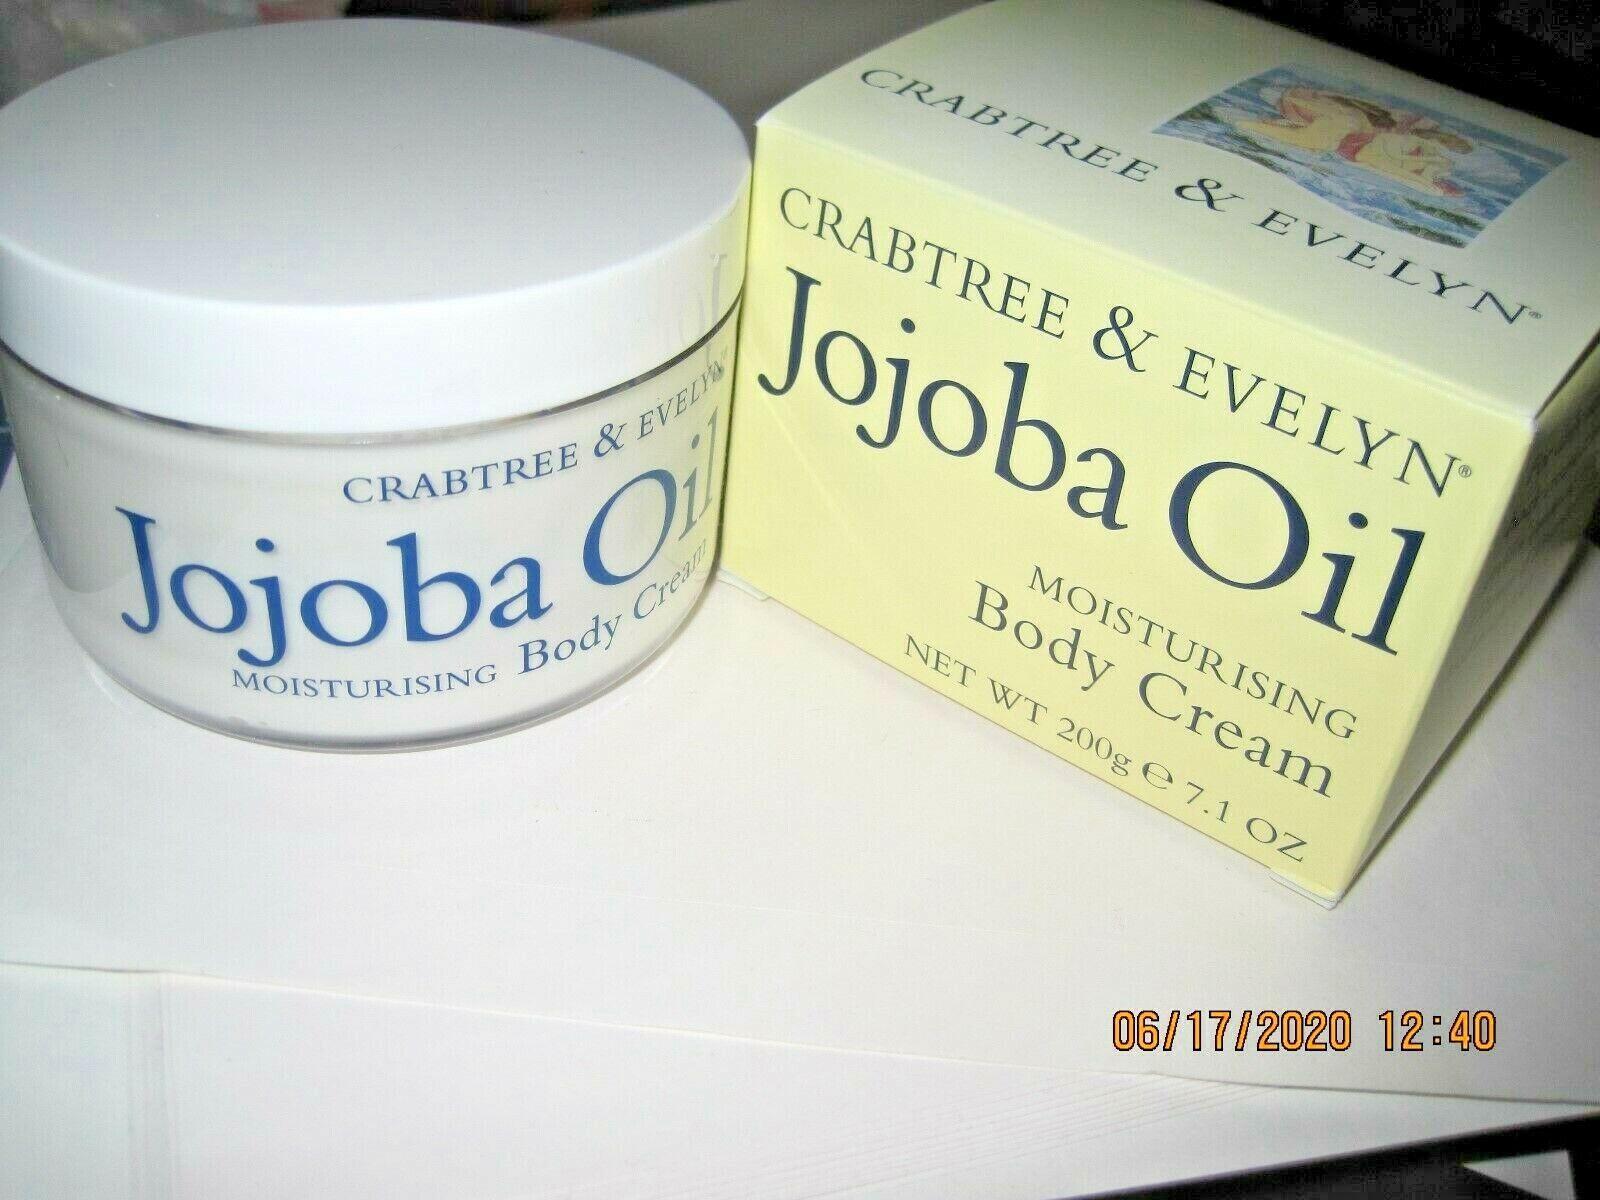 Crabtree & Evelyn Moisturising Body Cream, Jojoba Oil, 7 fl.